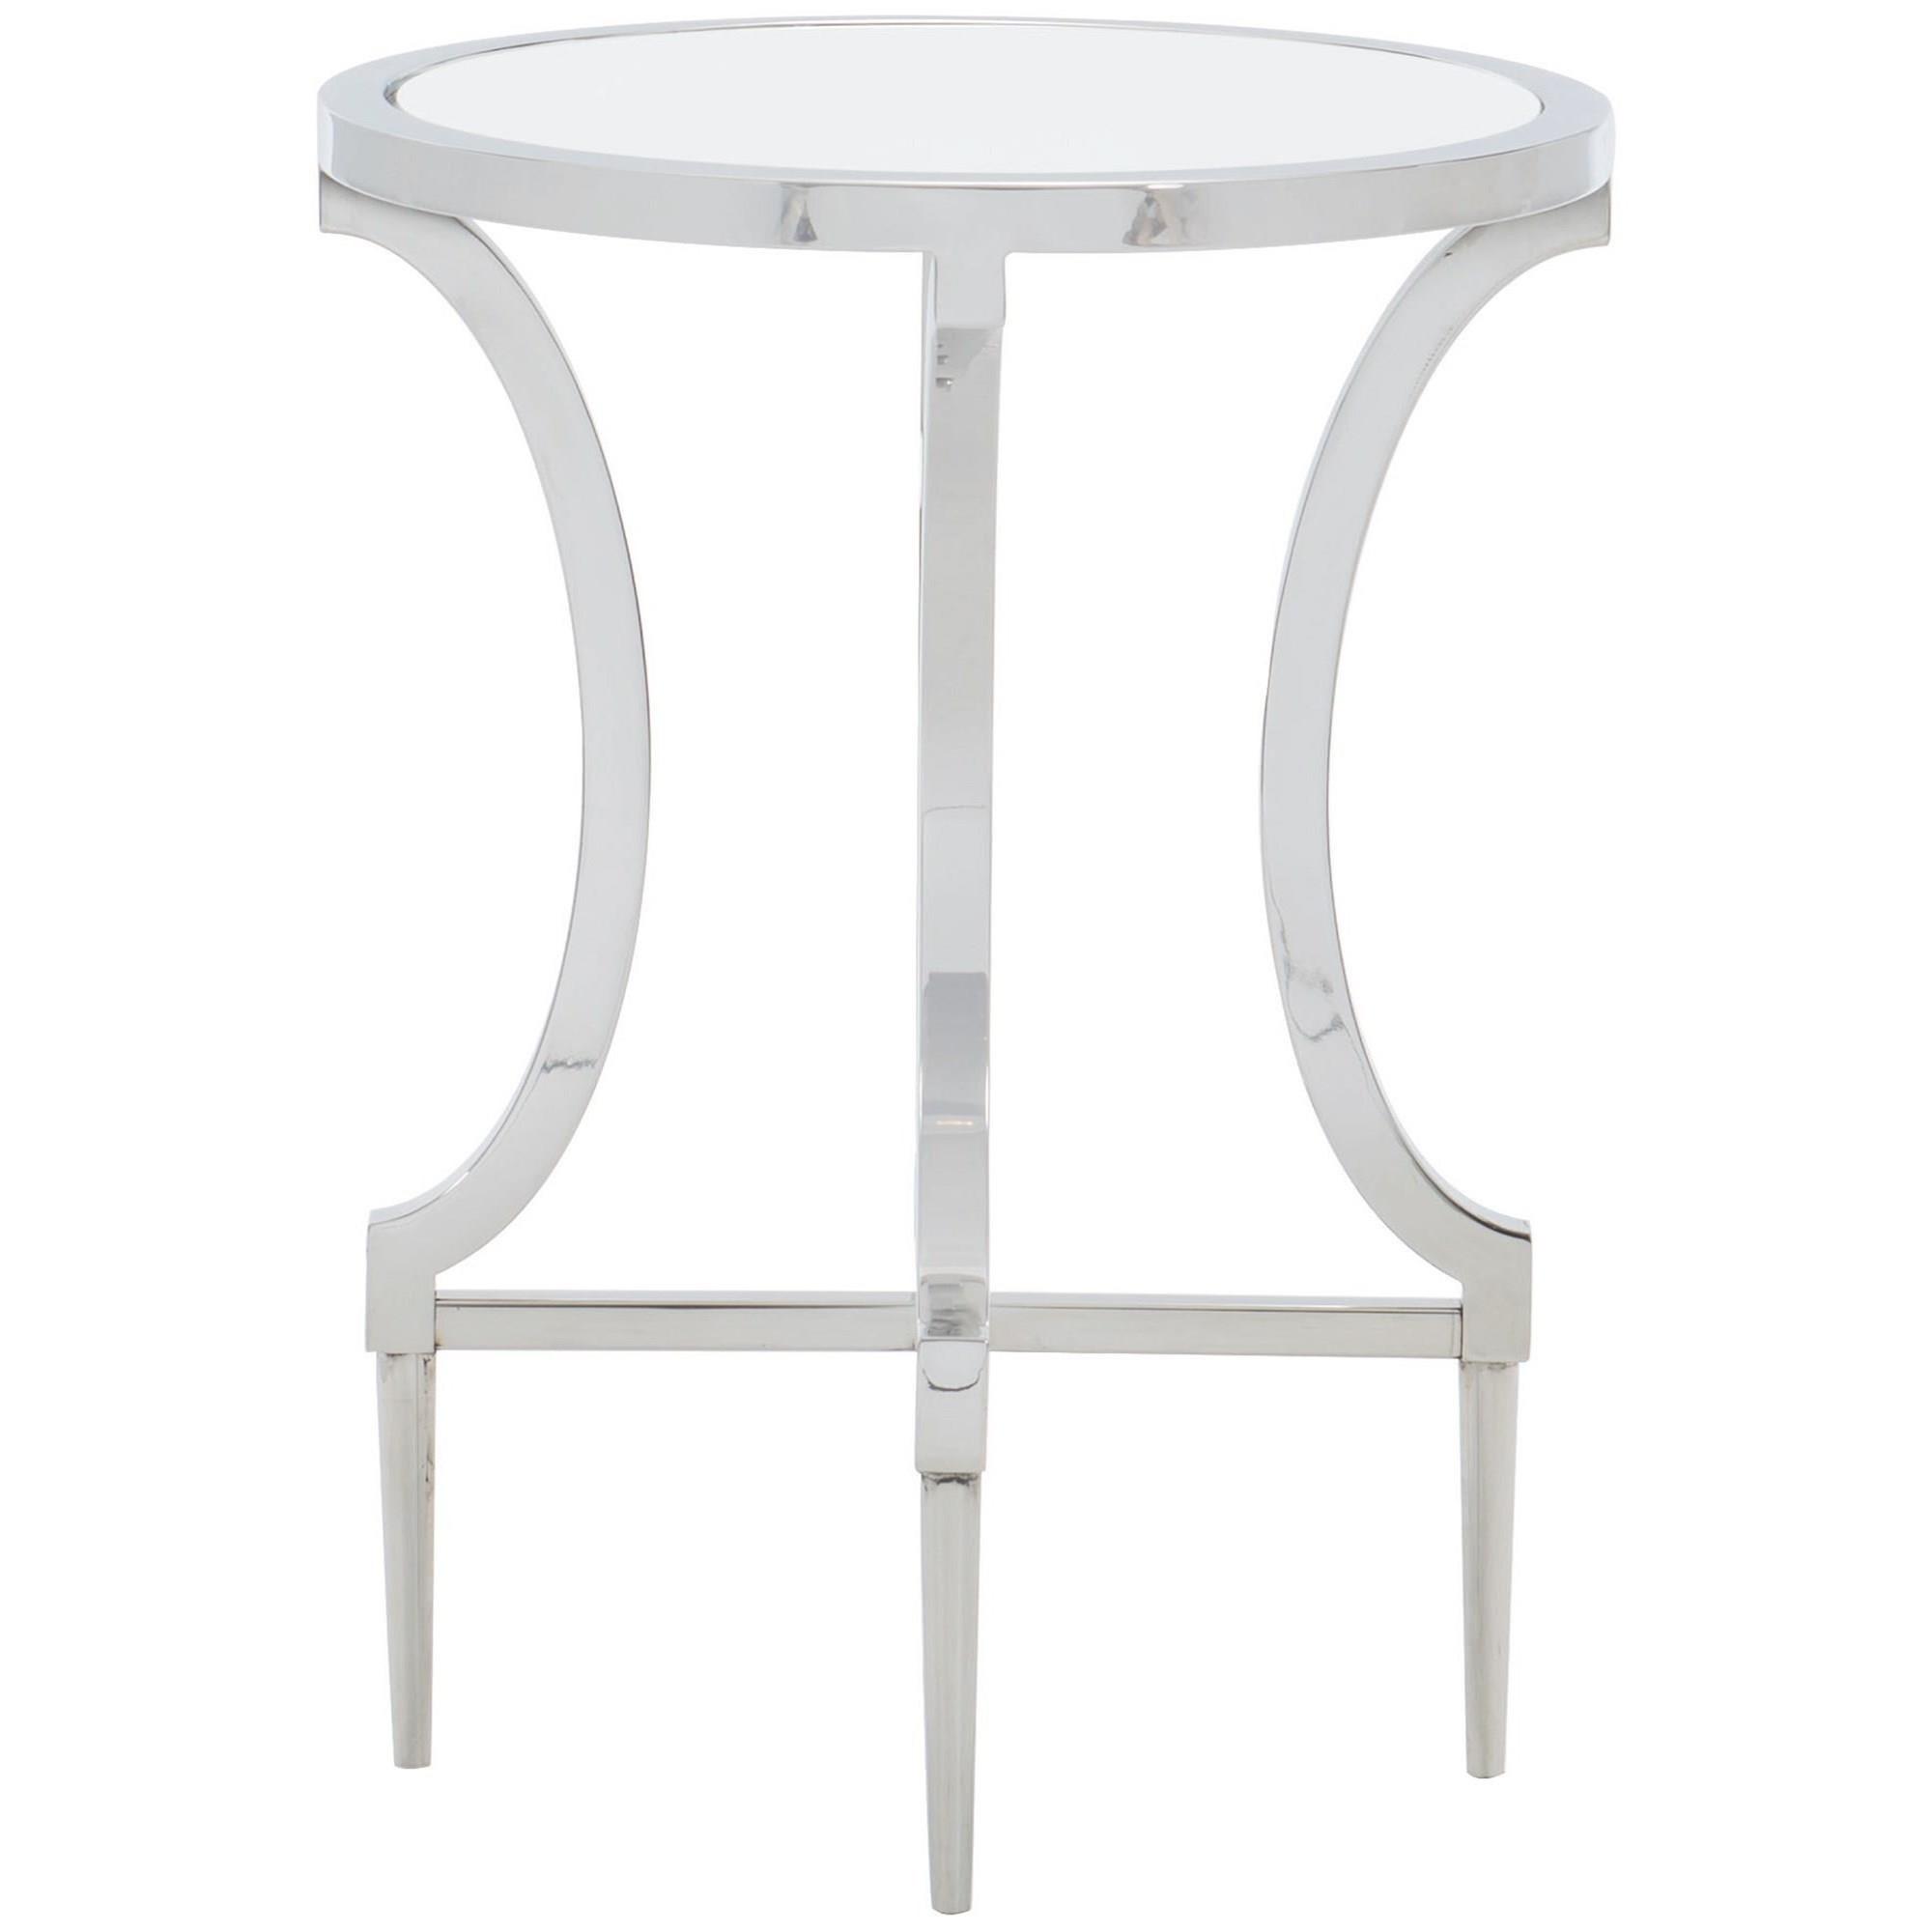 Amazing Bernhardt Portola 445 101 Contemporary Metal Round Drink Onthecornerstone Fun Painted Chair Ideas Images Onthecornerstoneorg